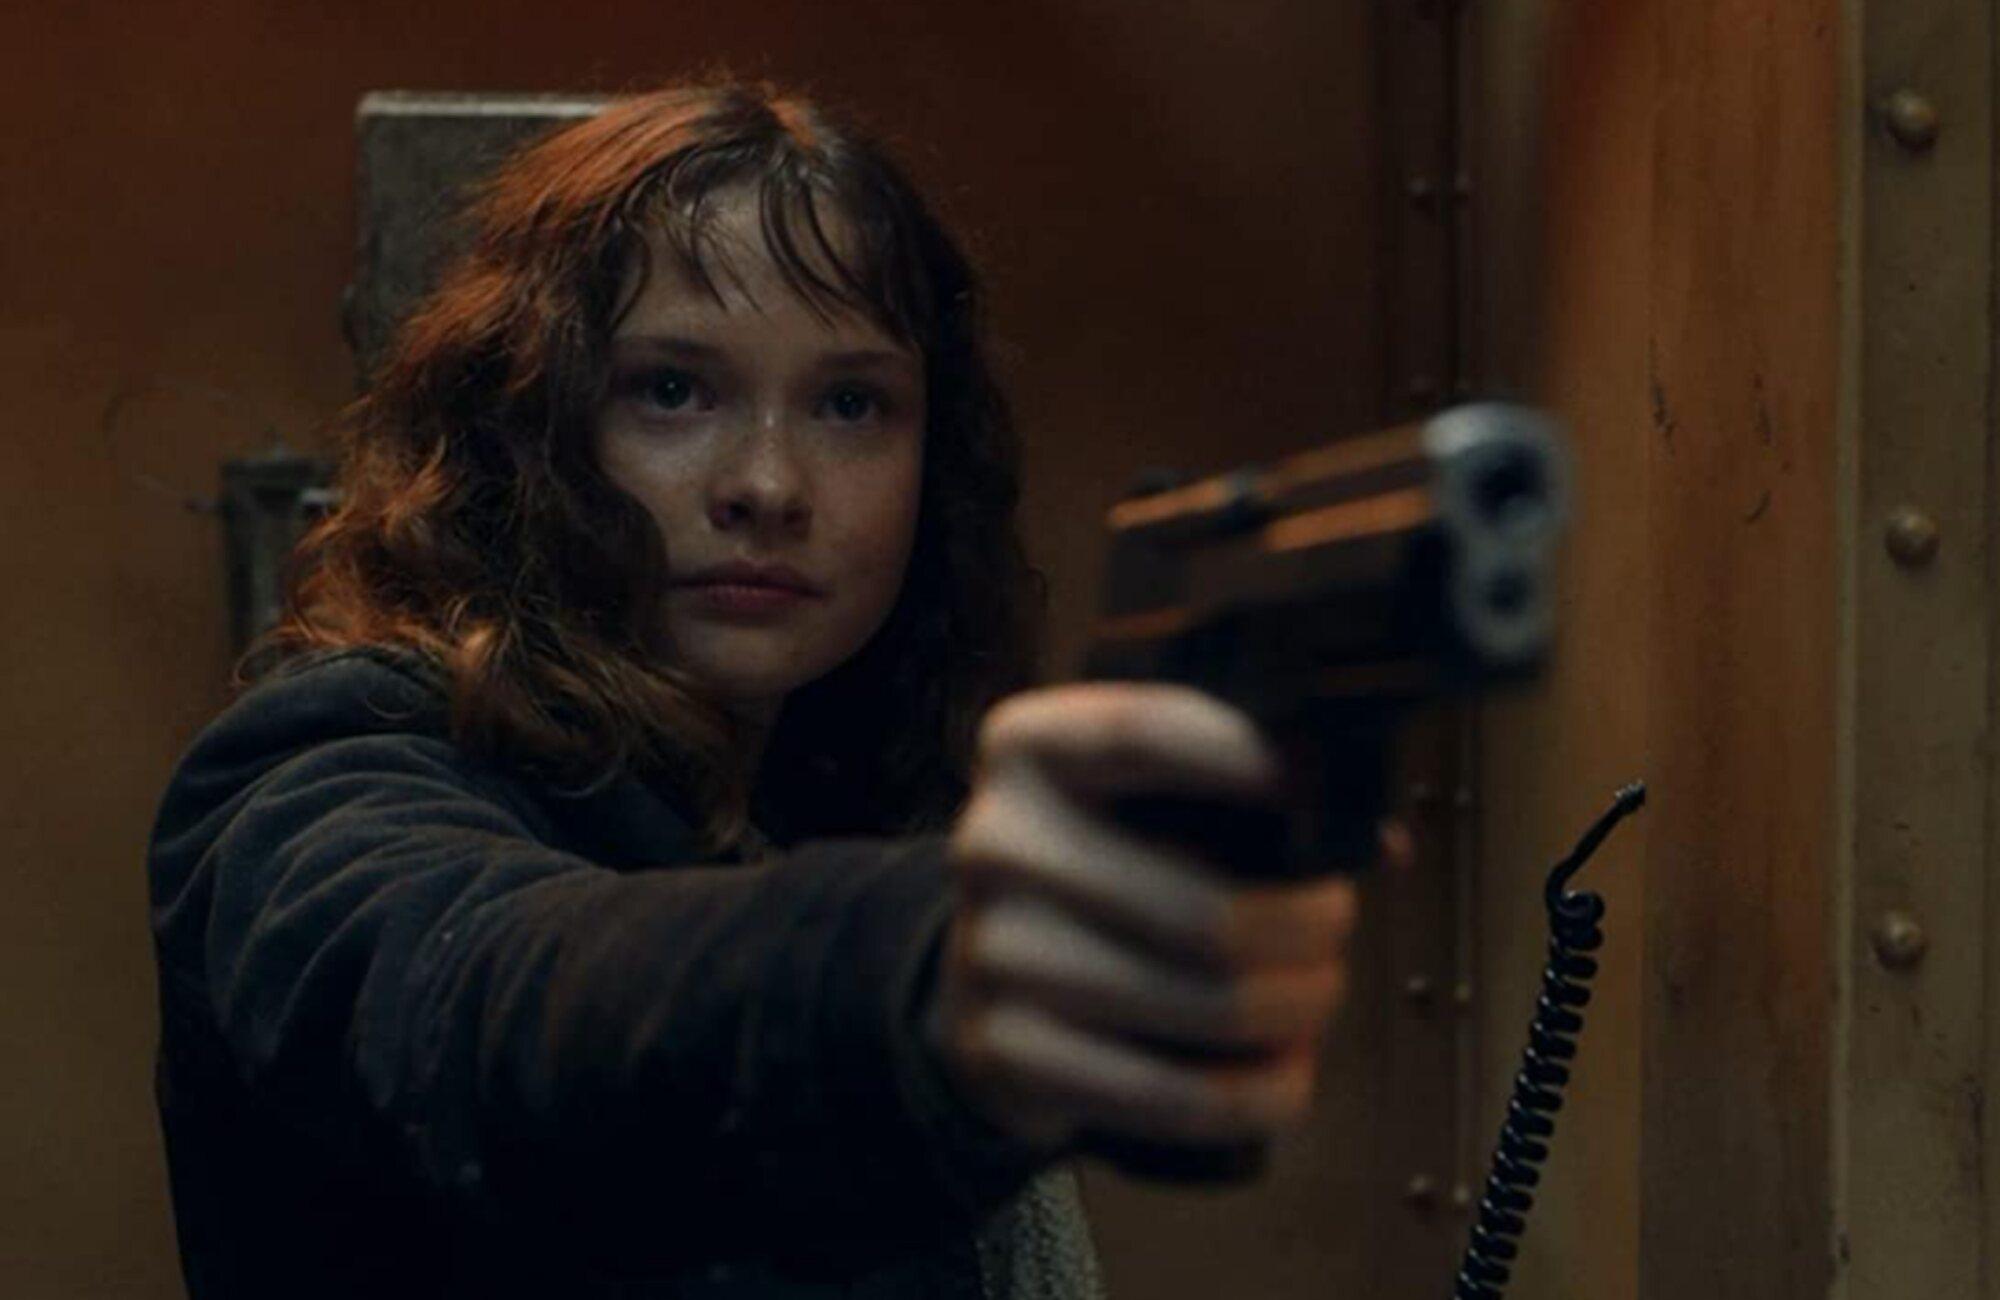 Dakota amenaza con un arma a Strand en Fear The Walking Dead